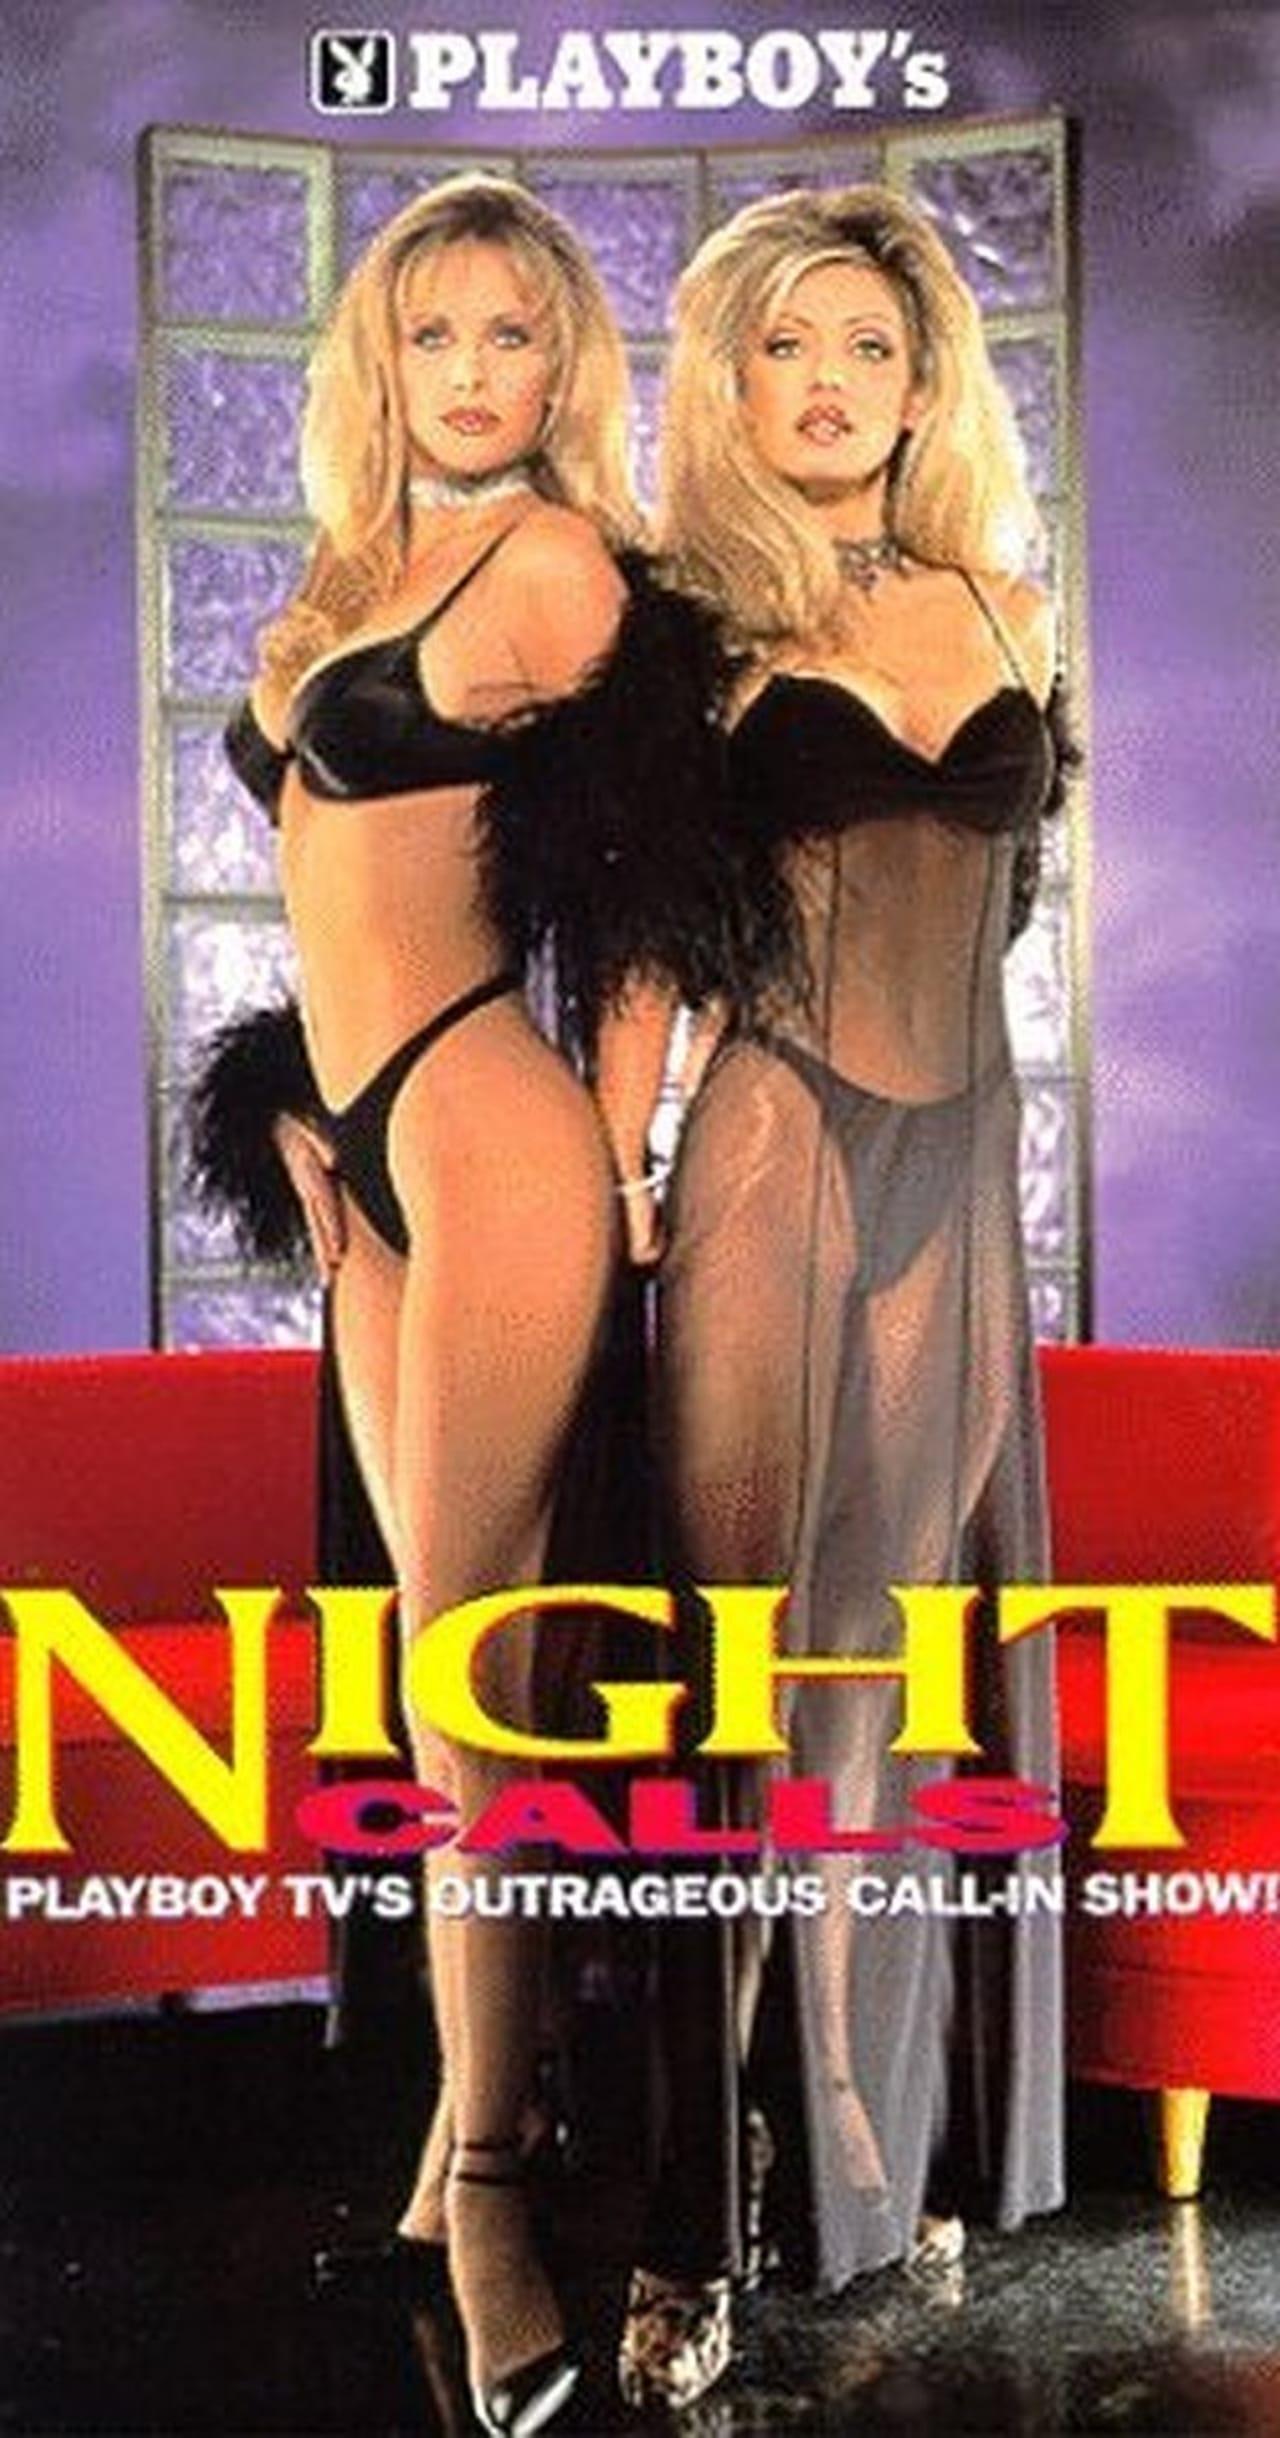 Night Calls: The Movie (1998)